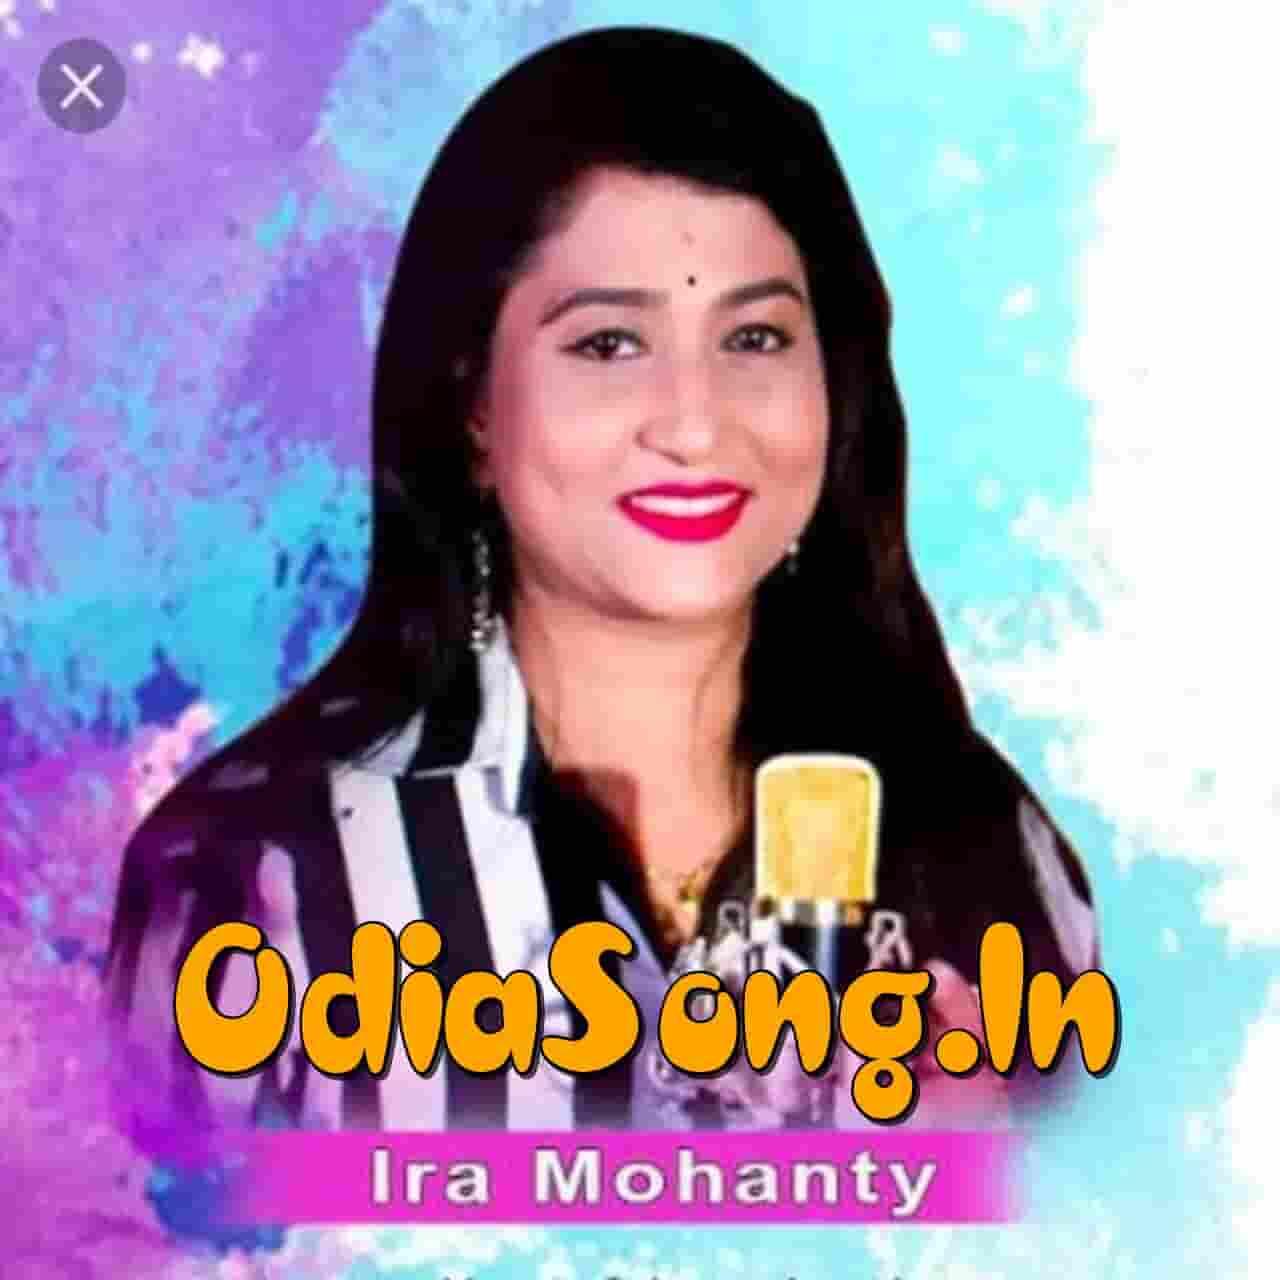 Chilkama - Odia Masti Song (Ira Mohanty, Sangram)